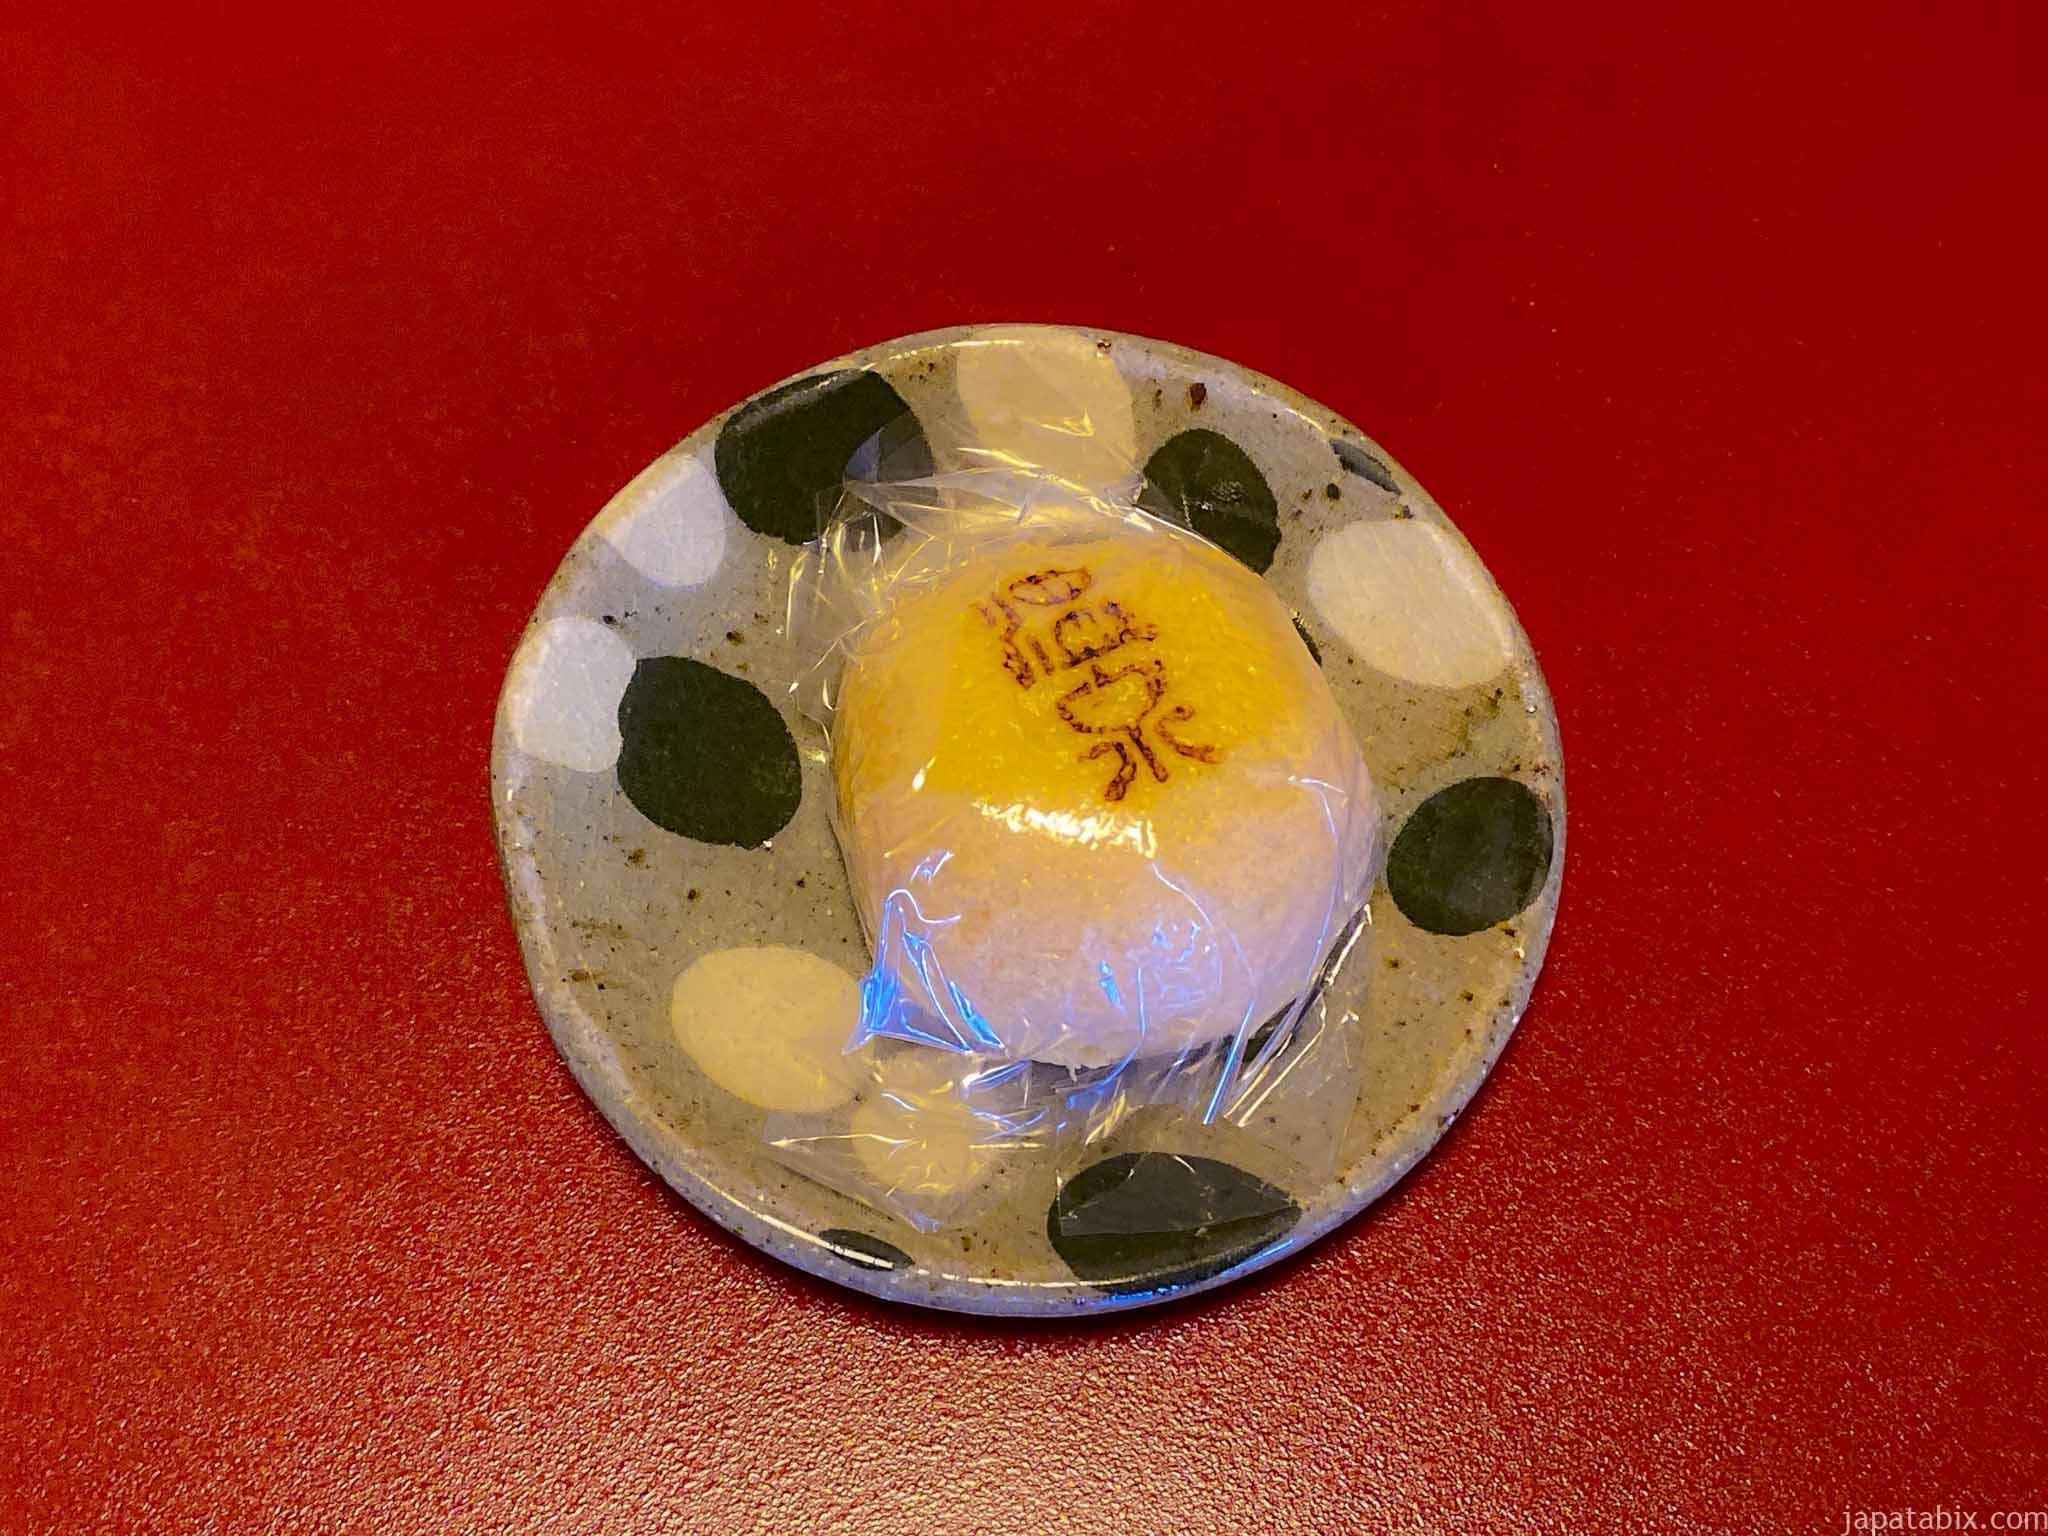 渋温泉 一乃湯果亭 部屋のお茶菓子